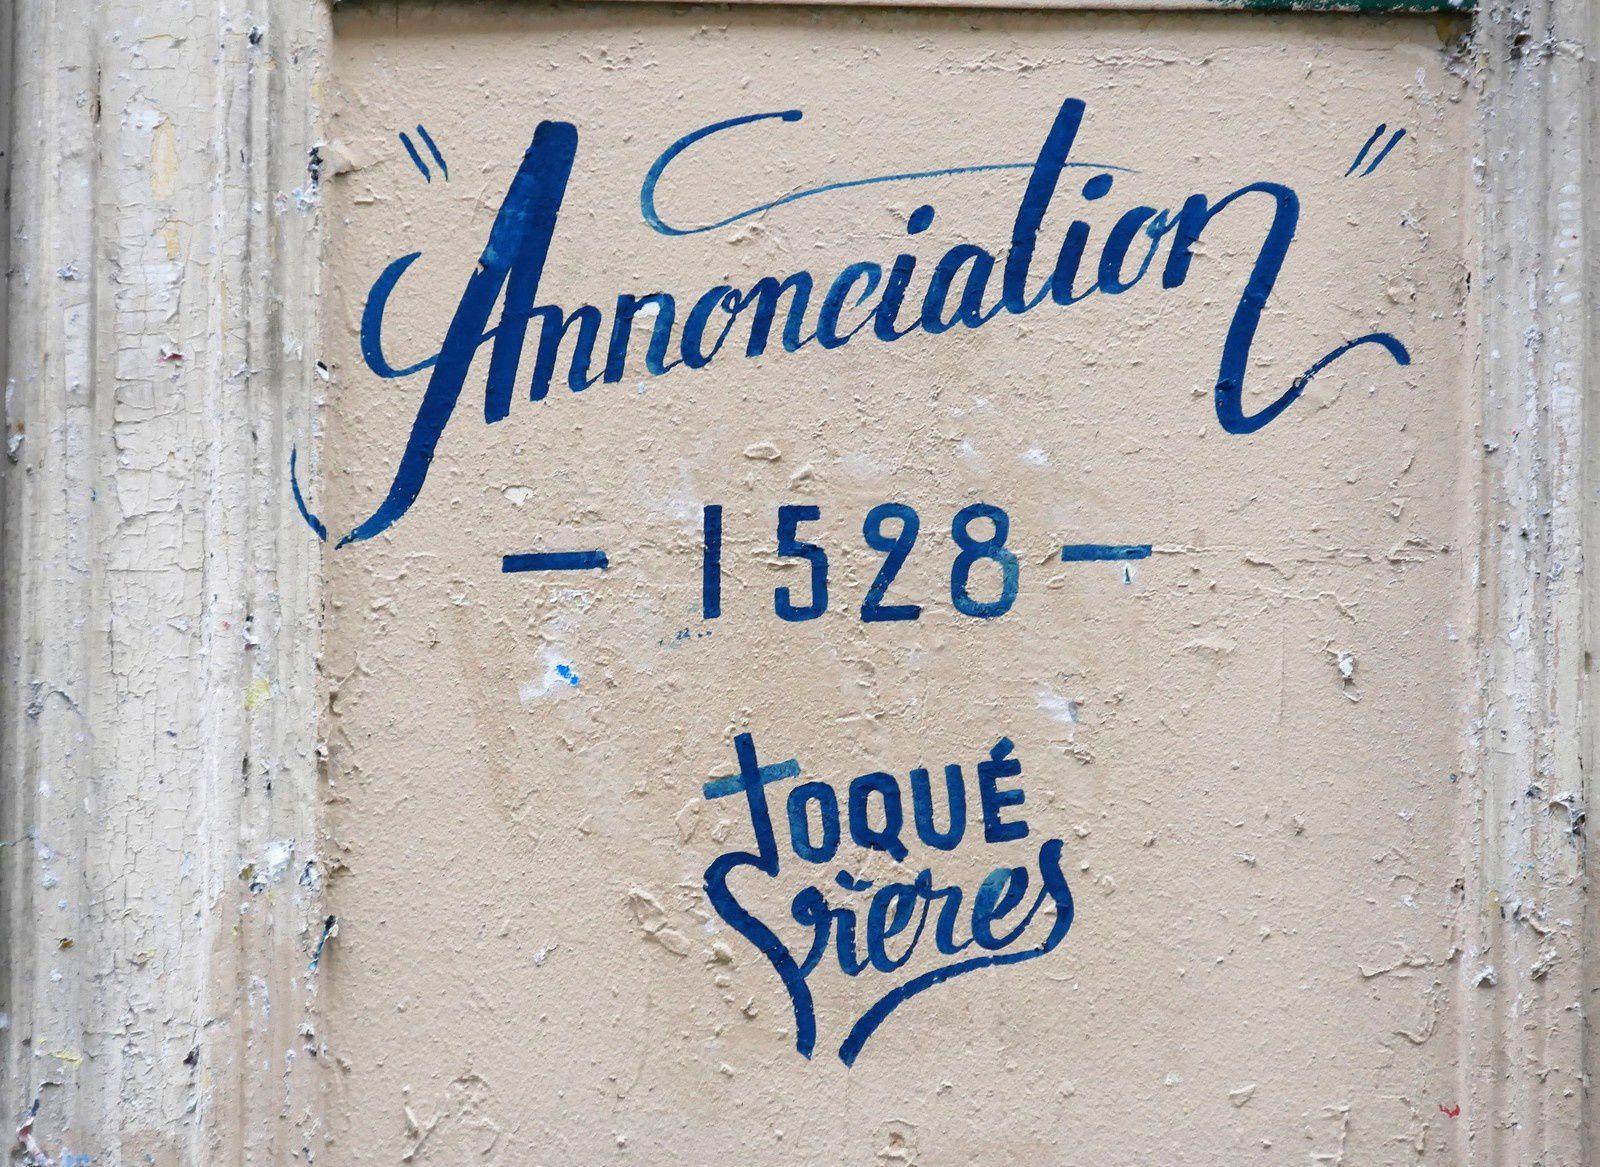 Les frères Toqué. Rue André Del Sarte. Annonciation.